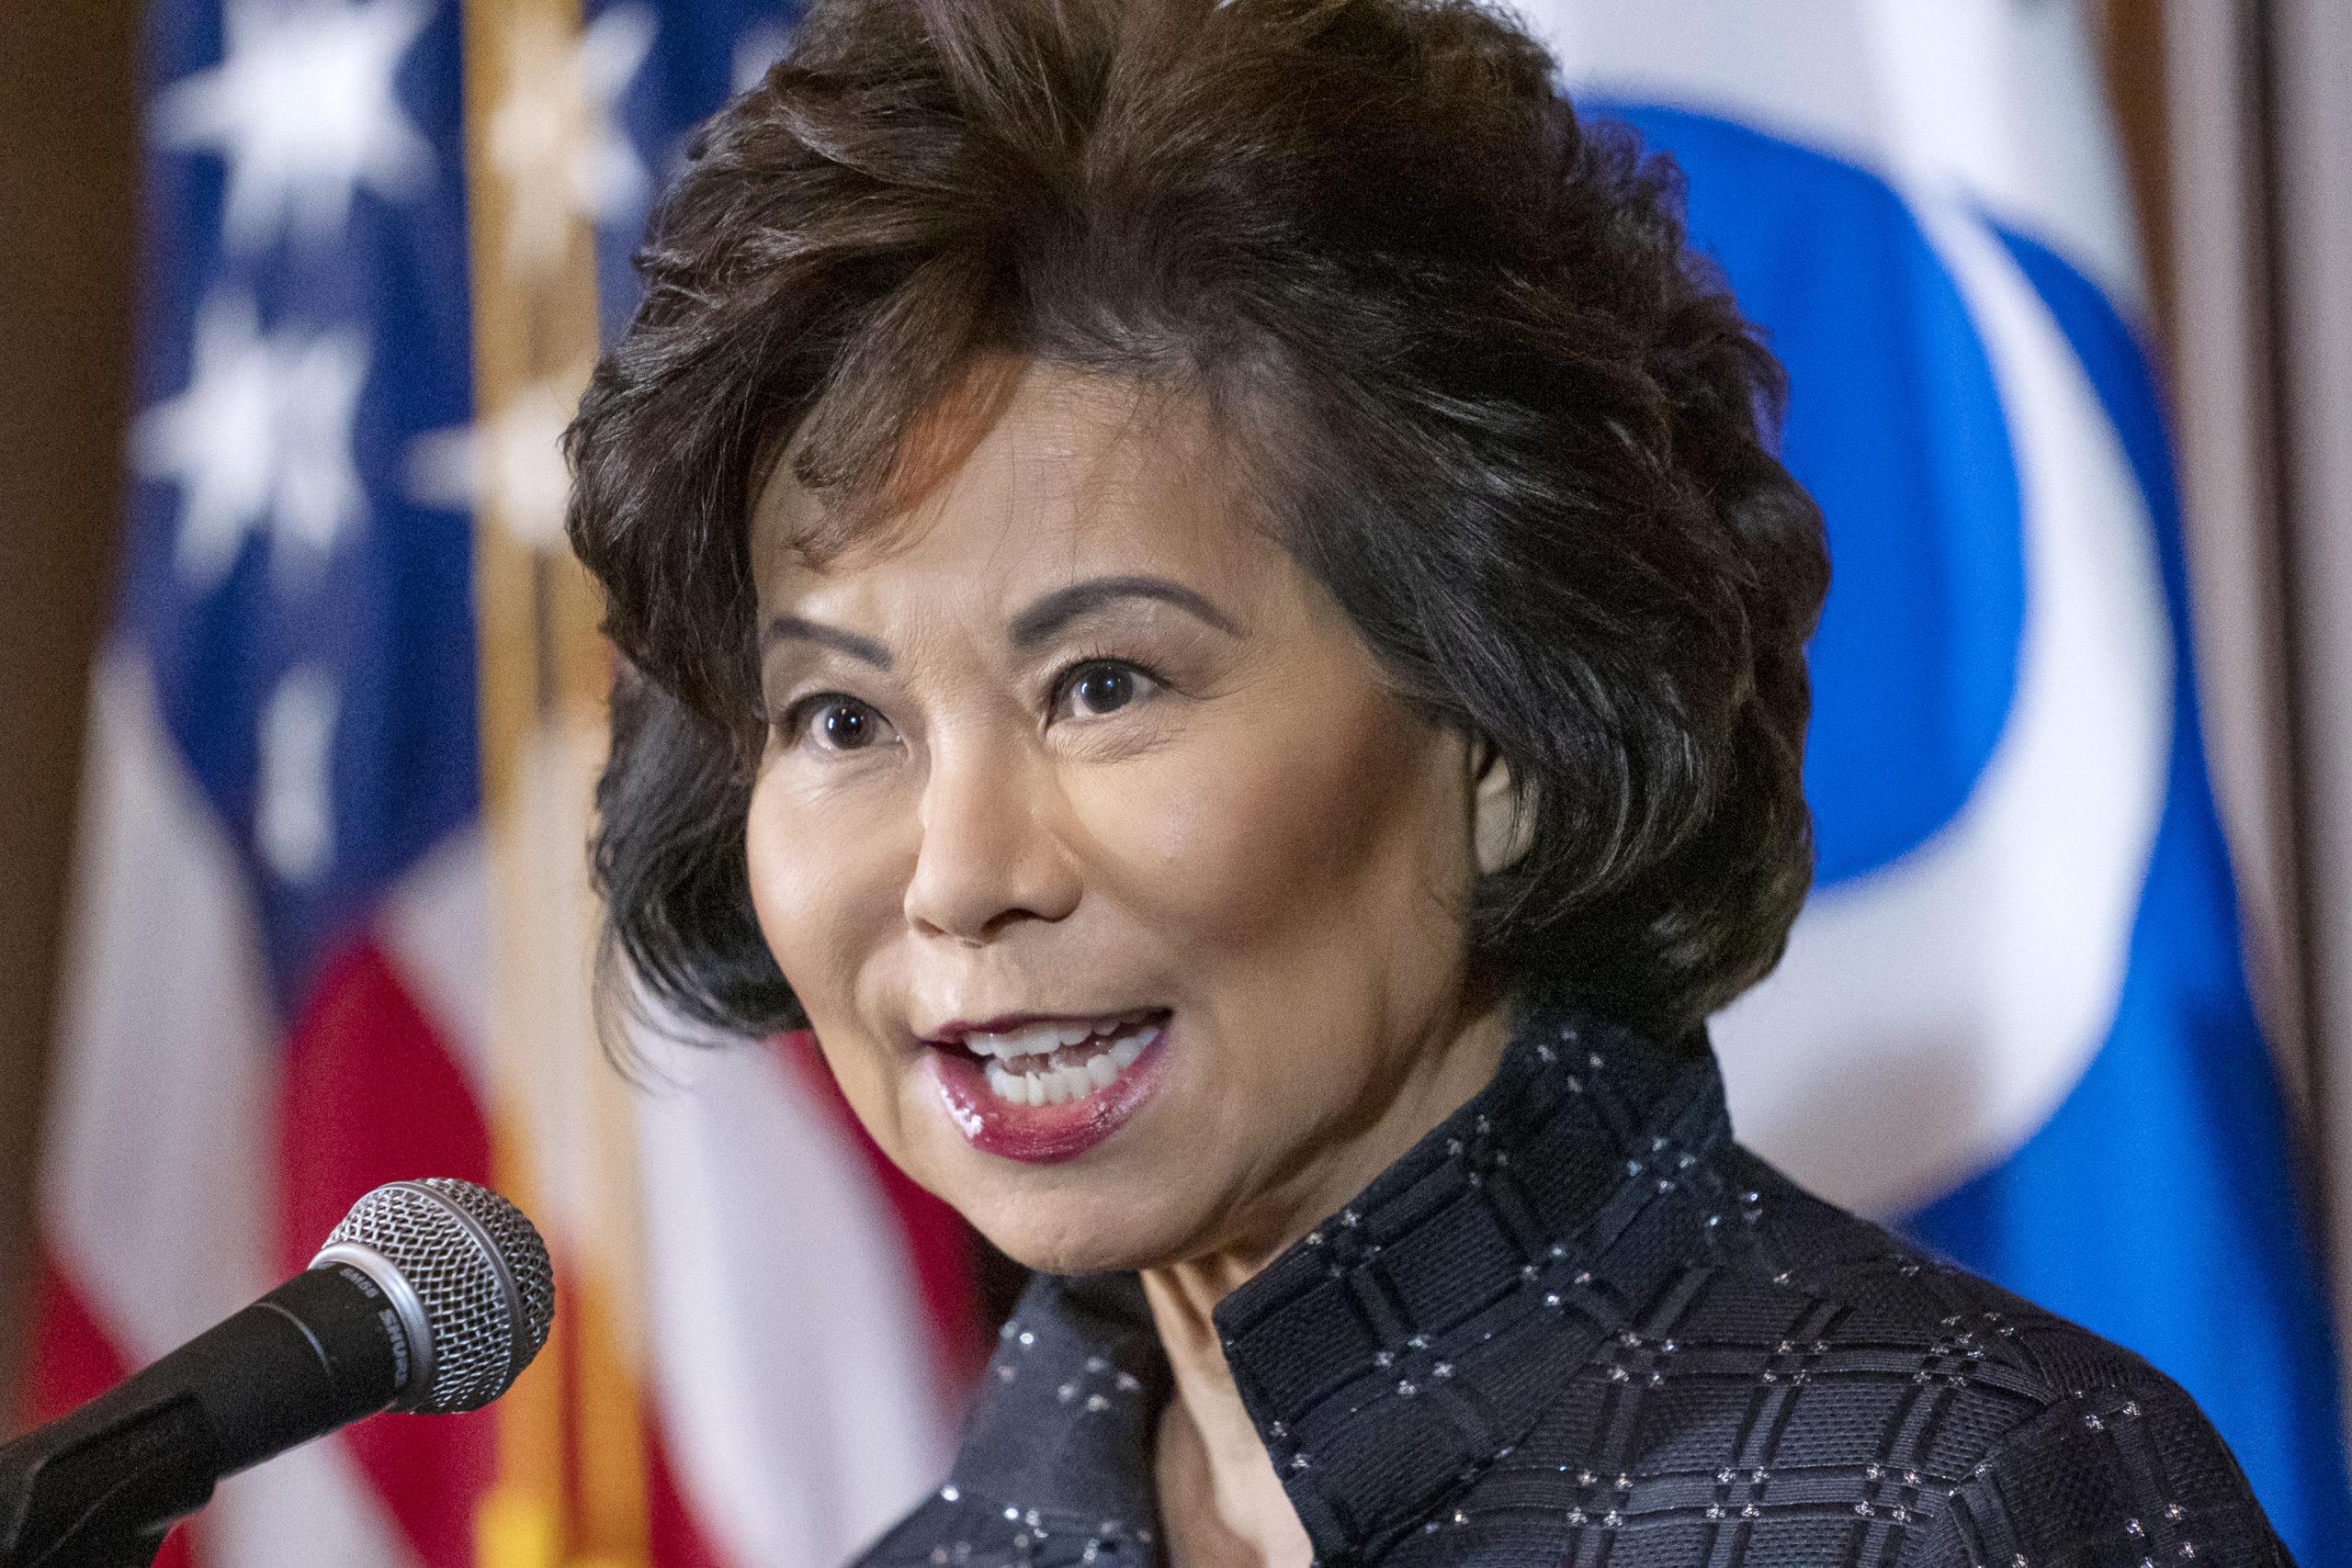 In this Sept. 18, 2019 file photo, Transportation Secretary Elaine Chao speaks at EPA headquarters in Washington.